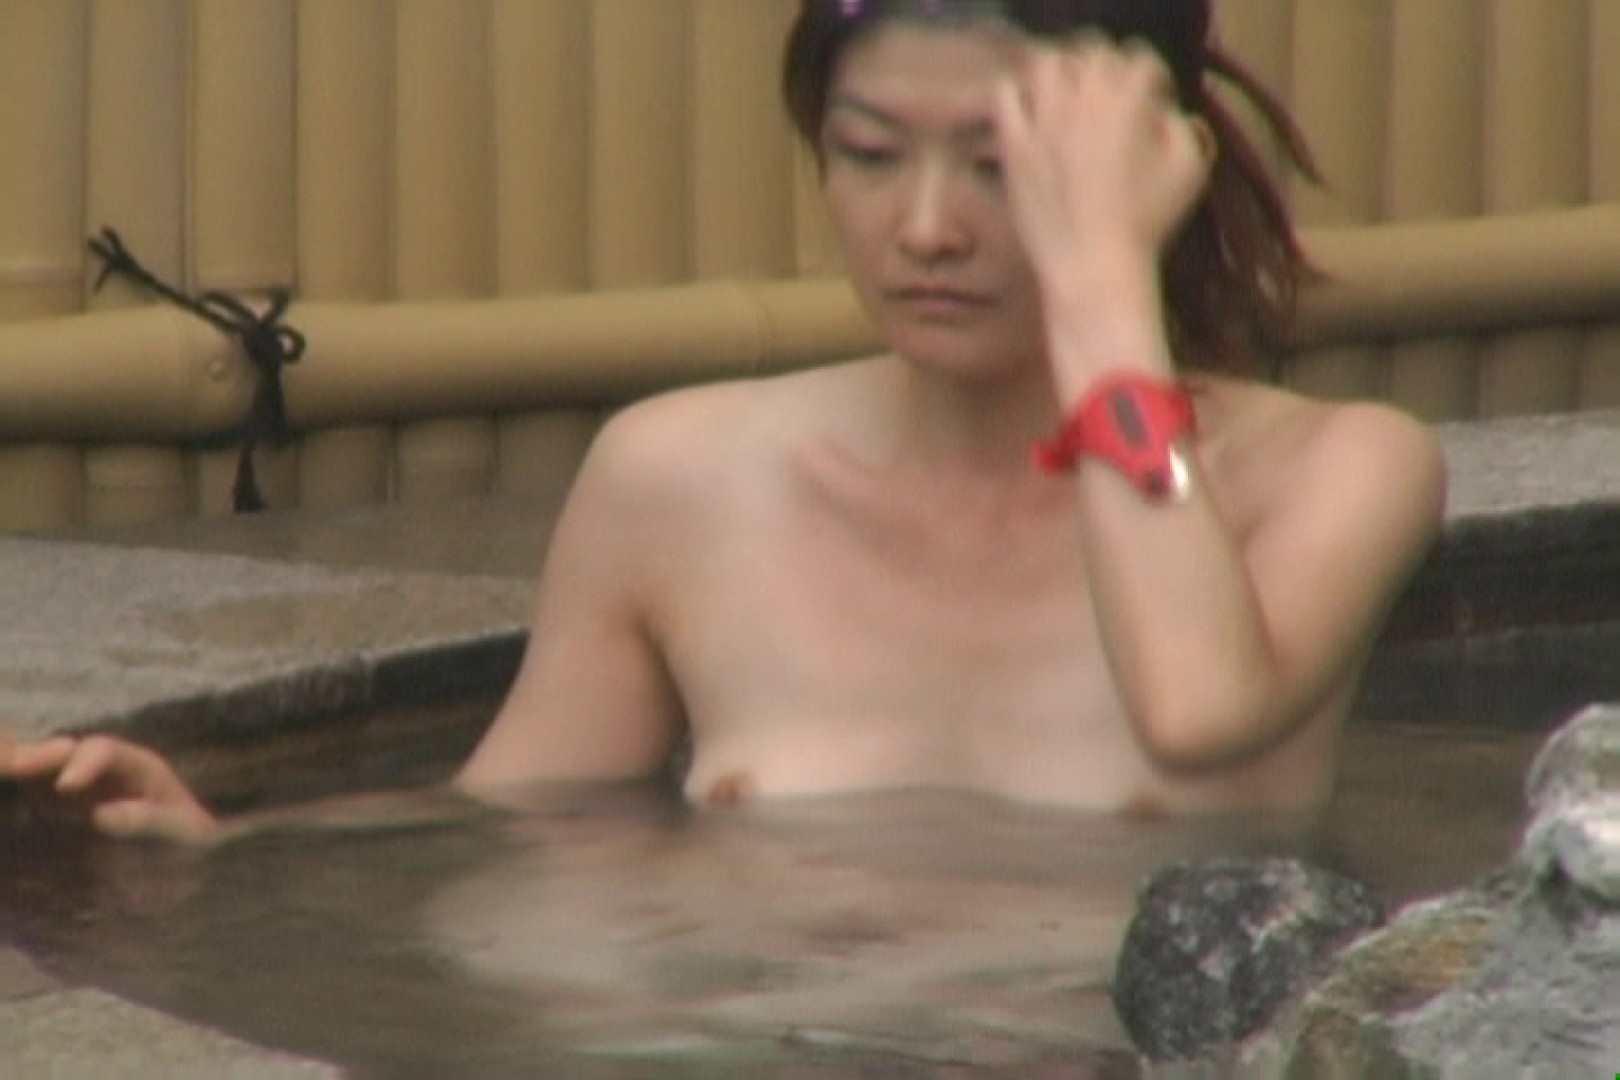 Aquaな露天風呂Vol.611 OLのエロ生活 おまんこ無修正動画無料 18連発 14